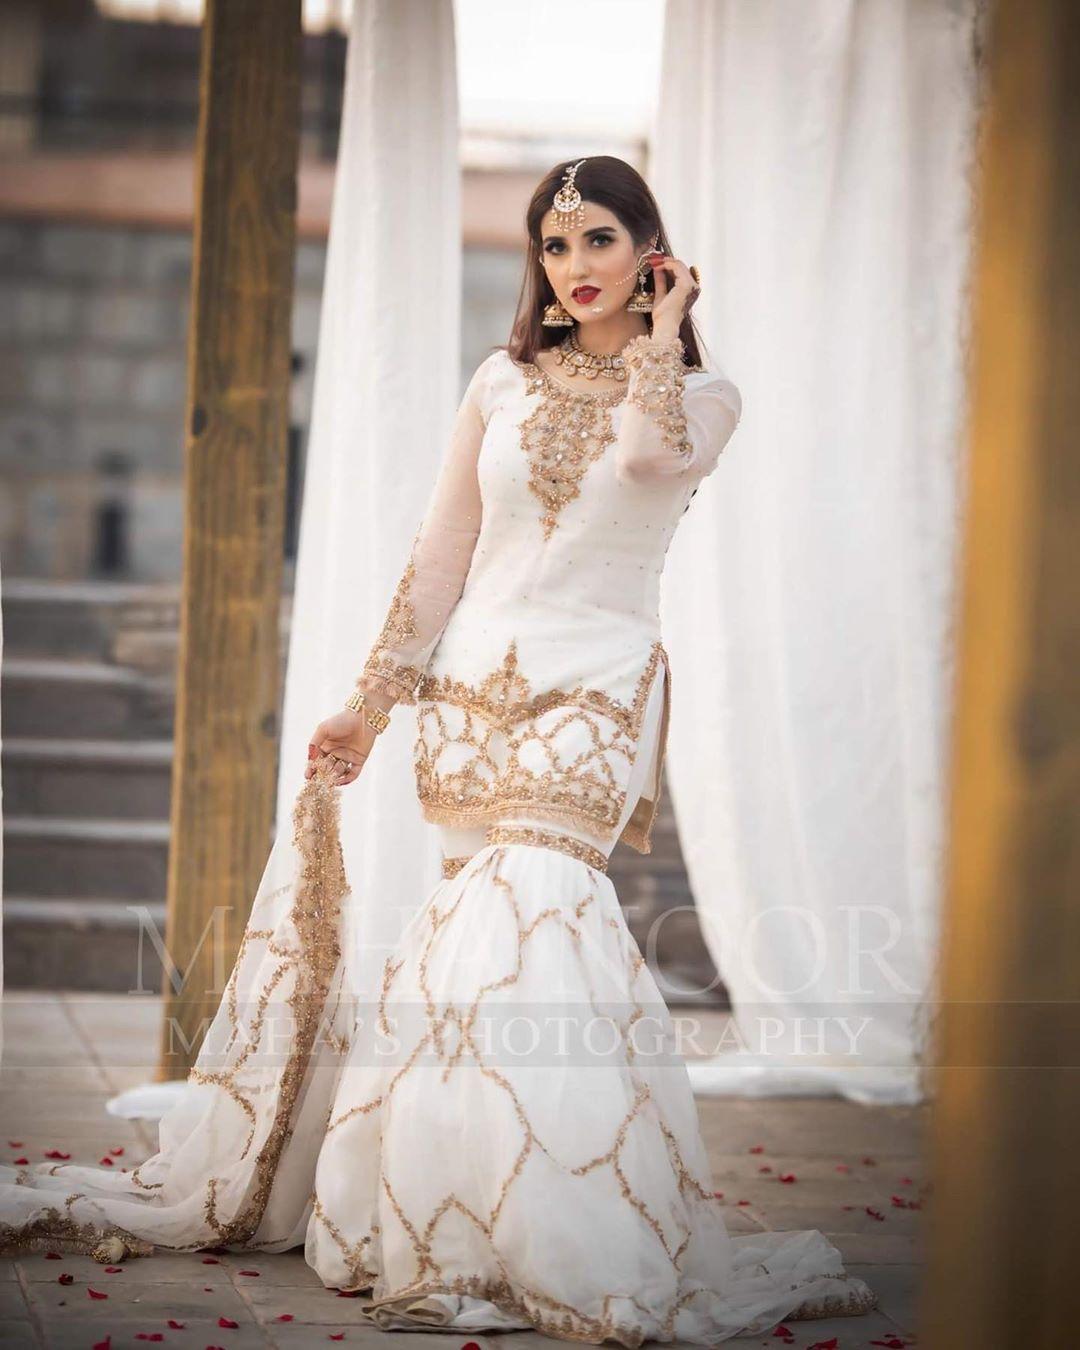 Gorgeous Hareem Farooq Photoshoot for Maha Wajahat Khan